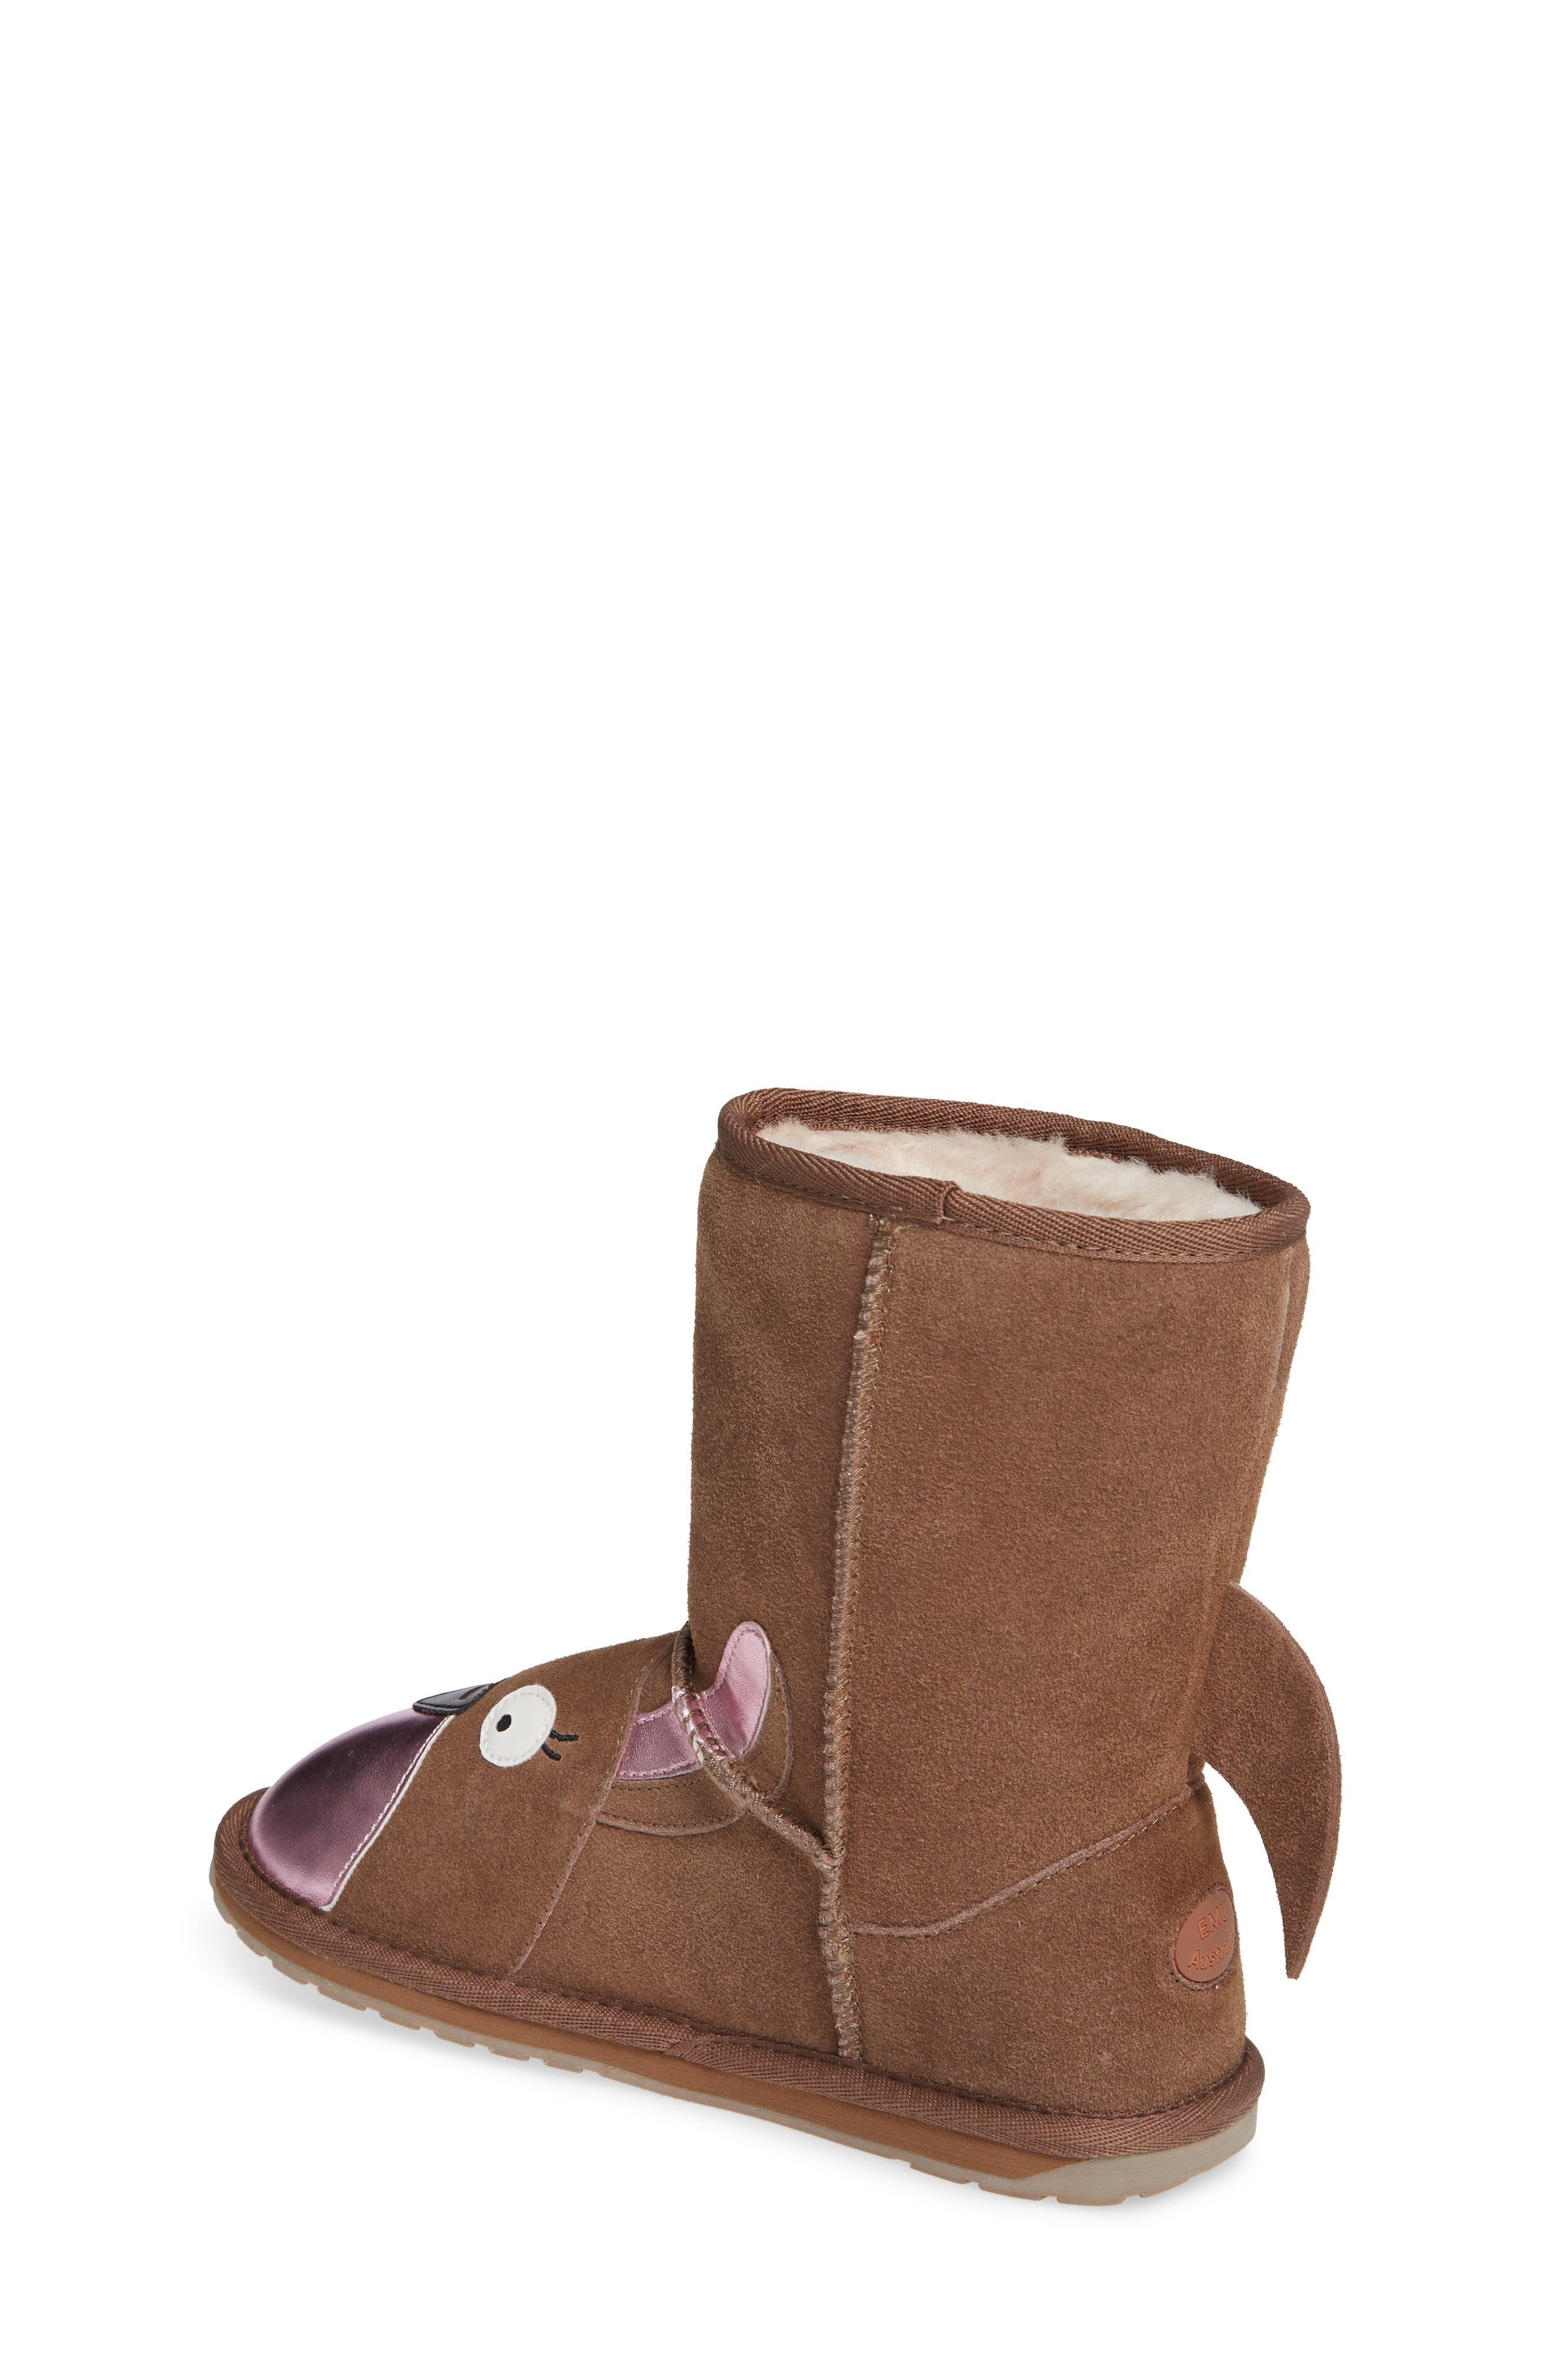 Kanga Wool Lined Boot,                             Alternate thumbnail 2, color,                             OAK